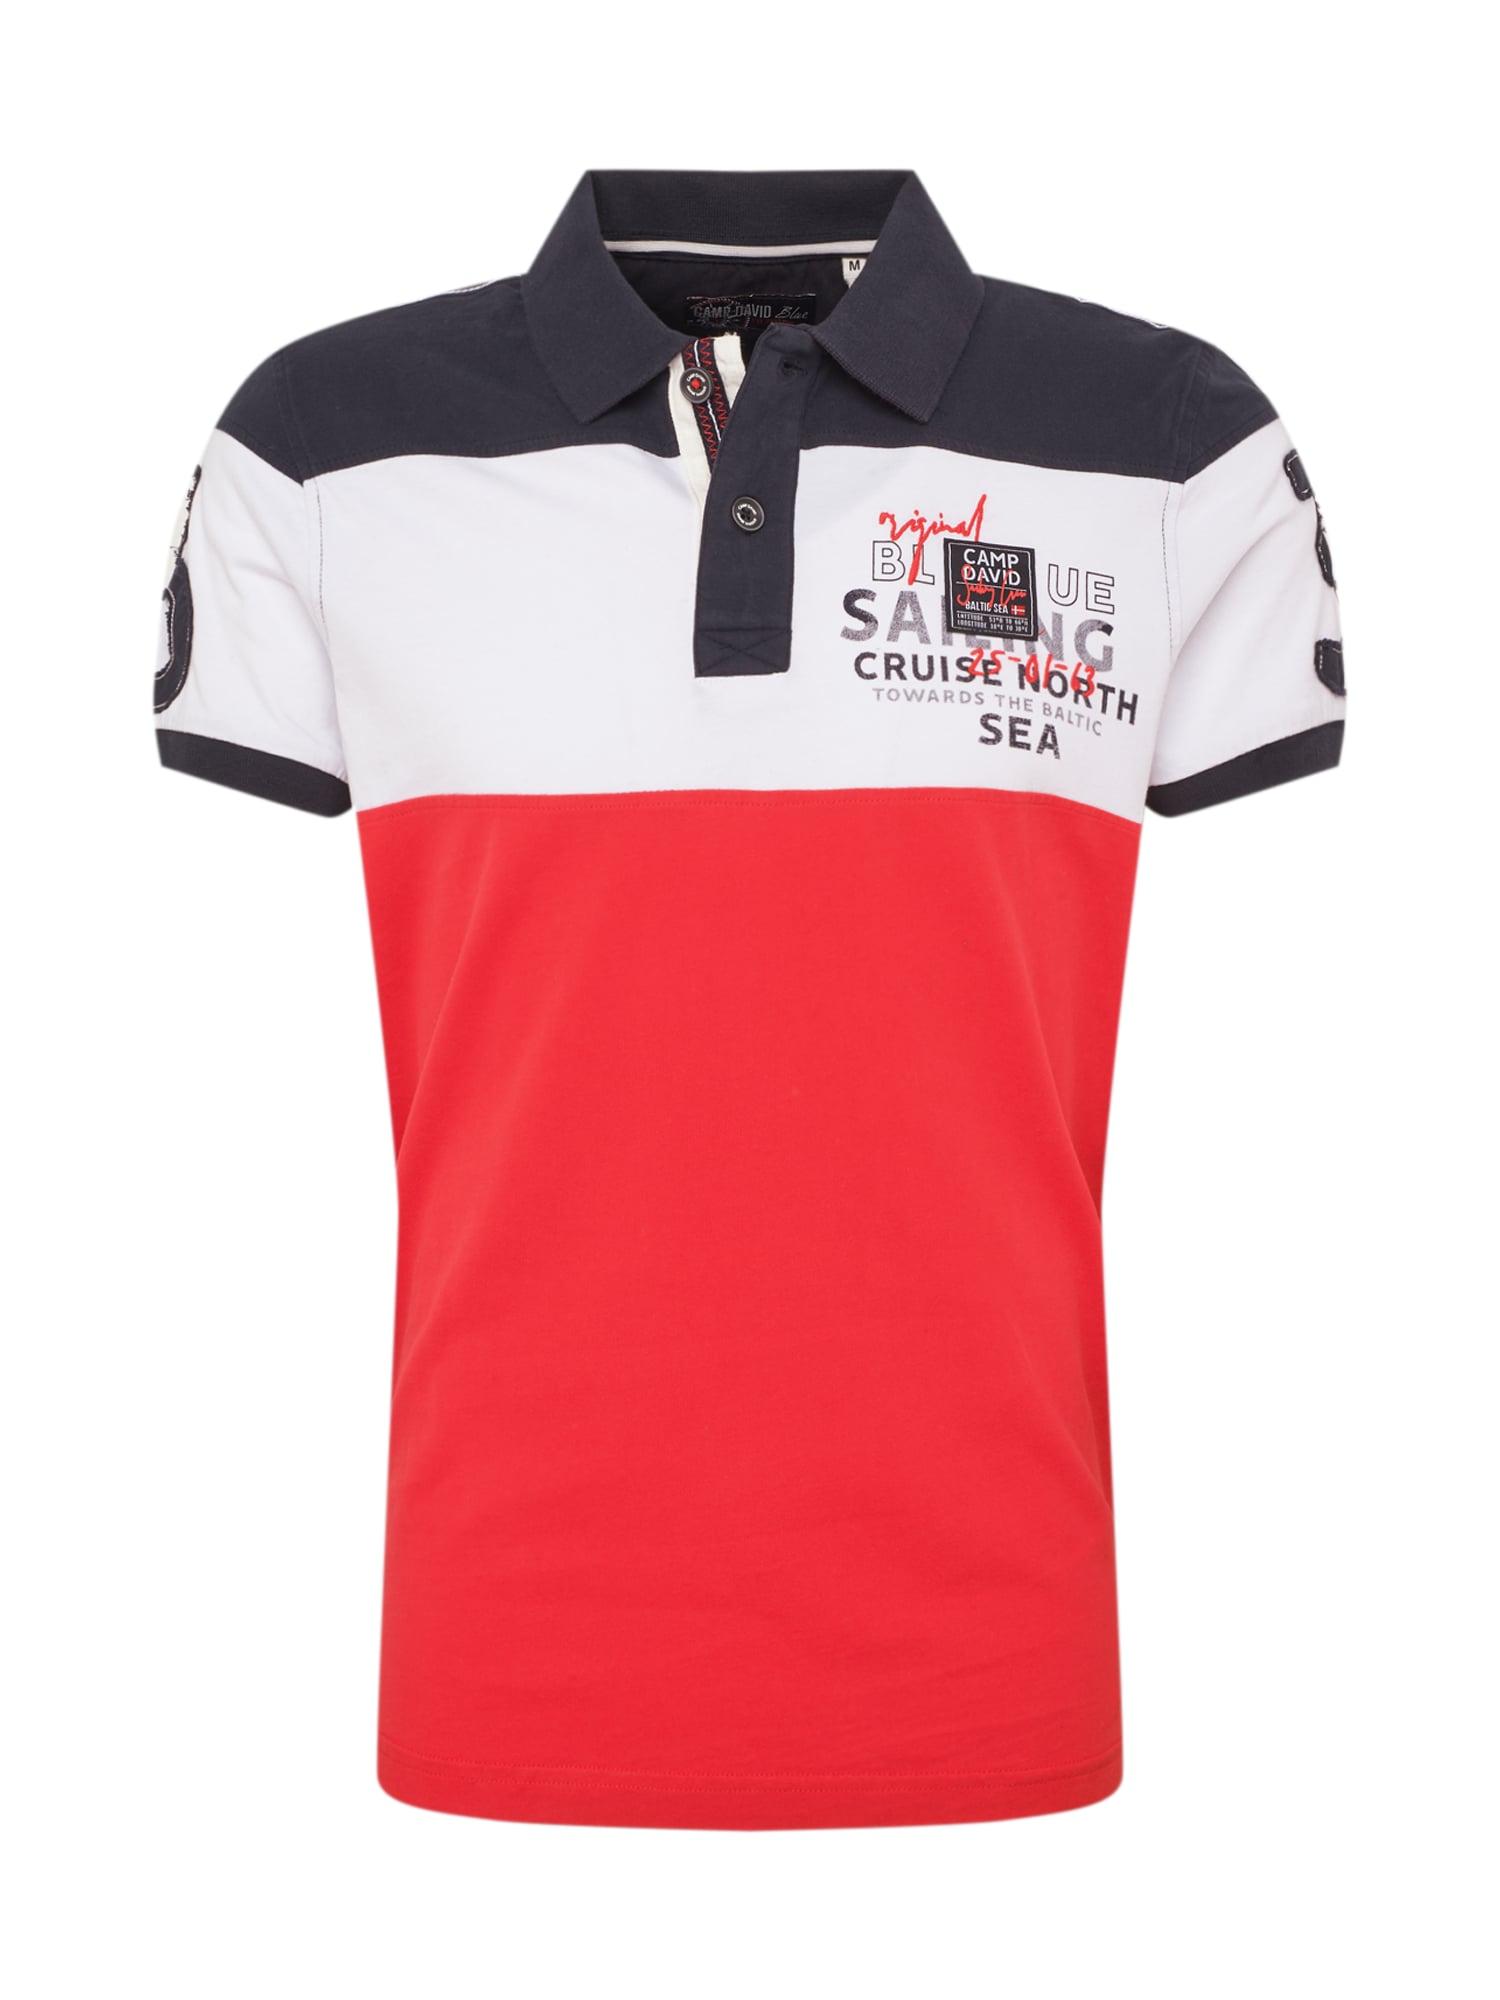 Tričko námořnická modř červená bílá CAMP DAVID